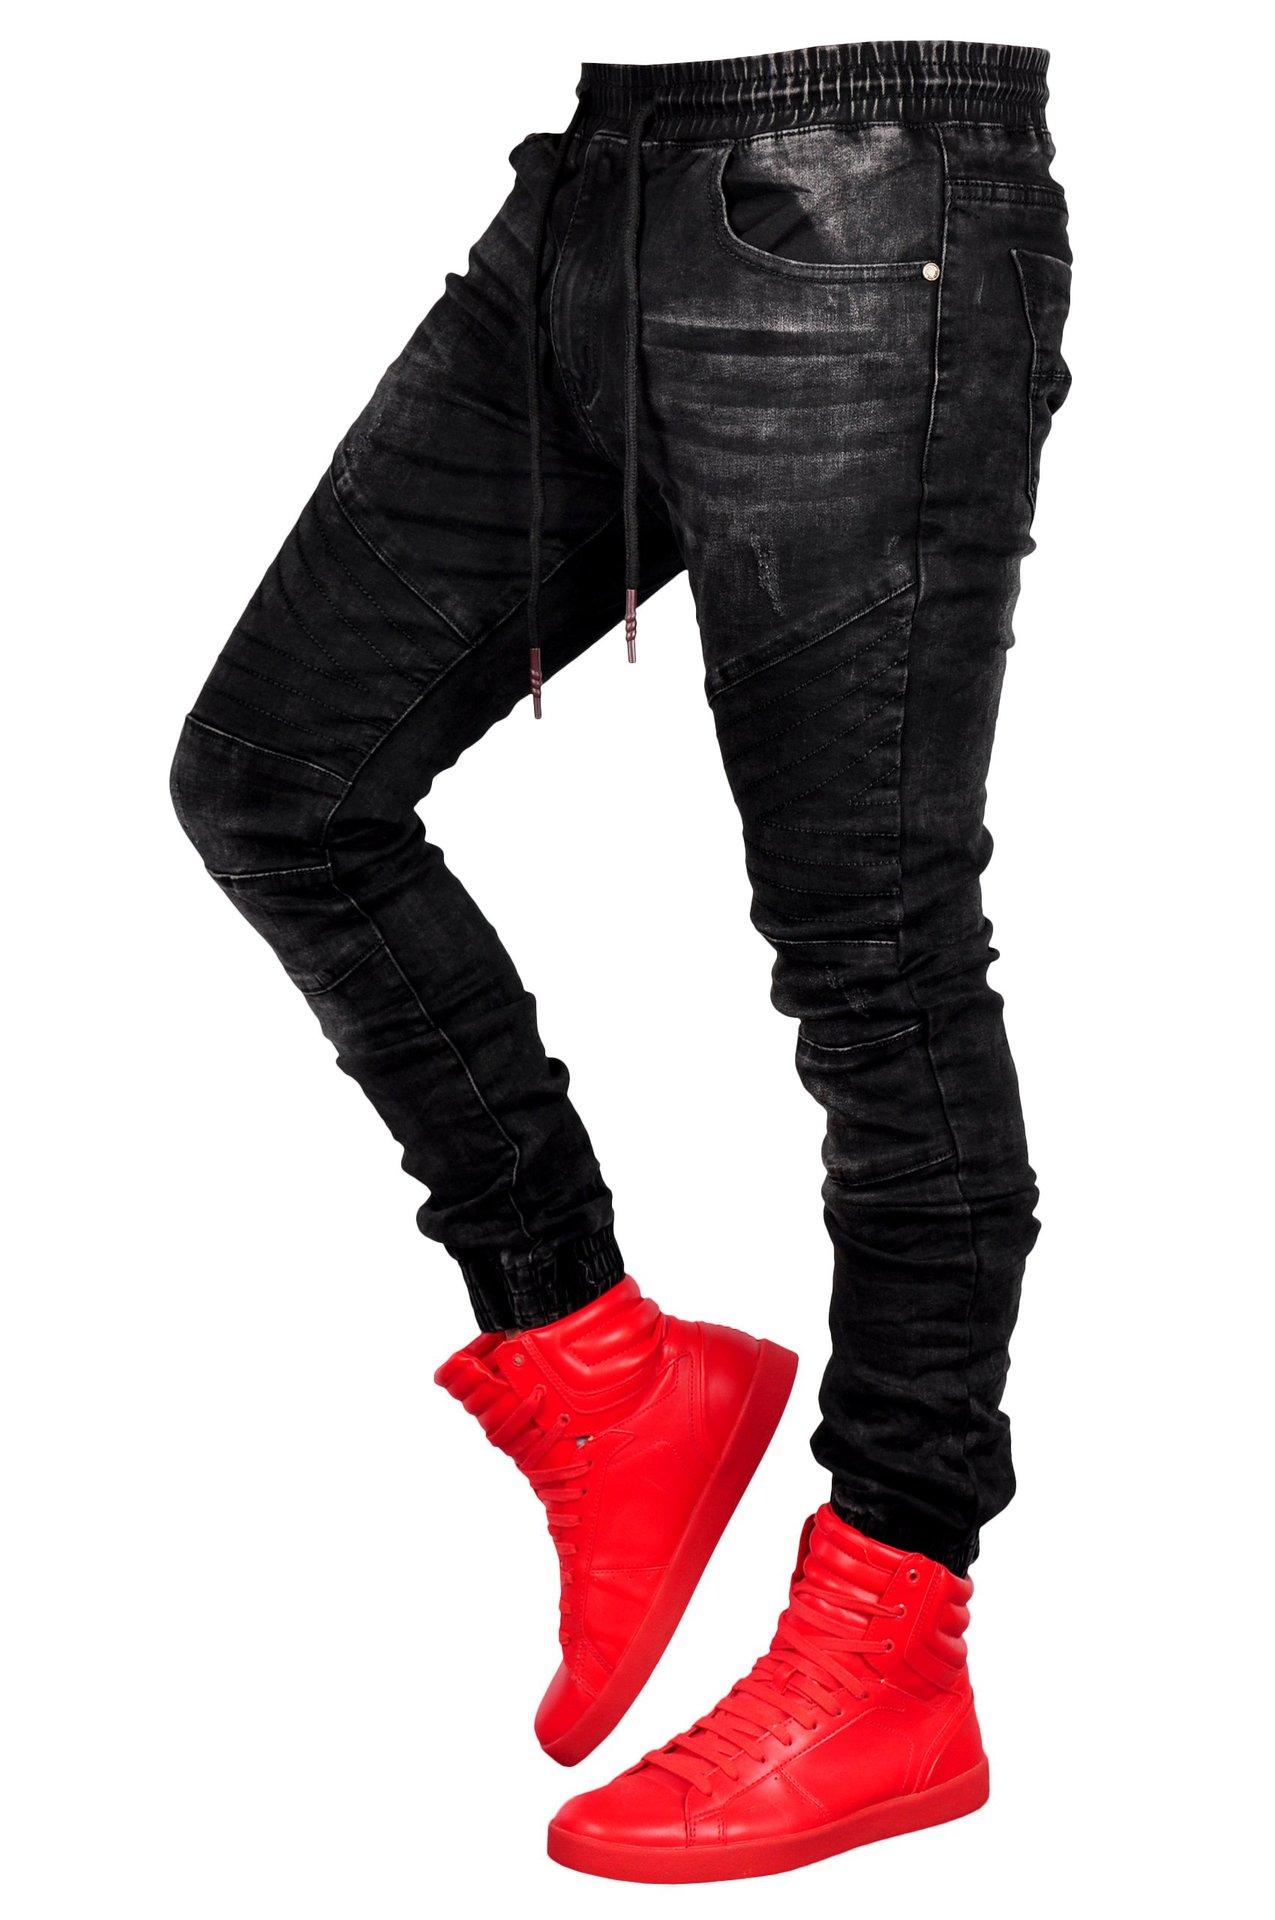 Vaqueros Hombre Denim Skinny Jogger Jeans Pria Slim Fit Hitam Biker Jeans Hombre Fashion Pinggang Elastis Jean Homme Denim Jeans Aliexpress